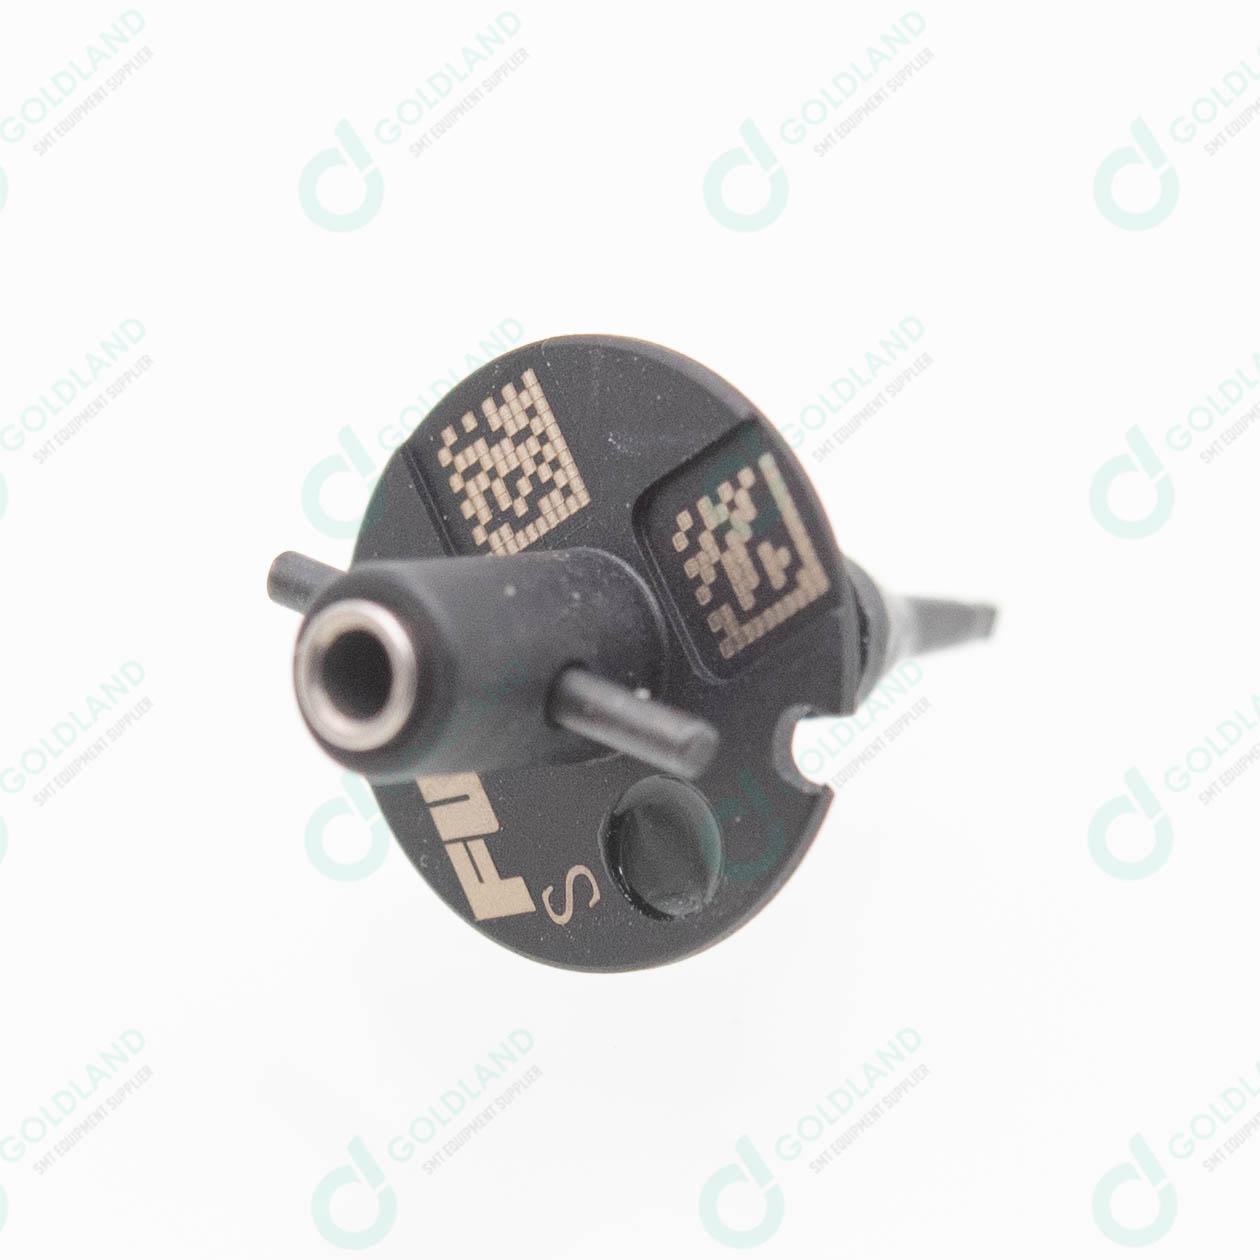 2AGKNG021600 FUJI Wide Range Nozzle S for FUJI smt machine parts